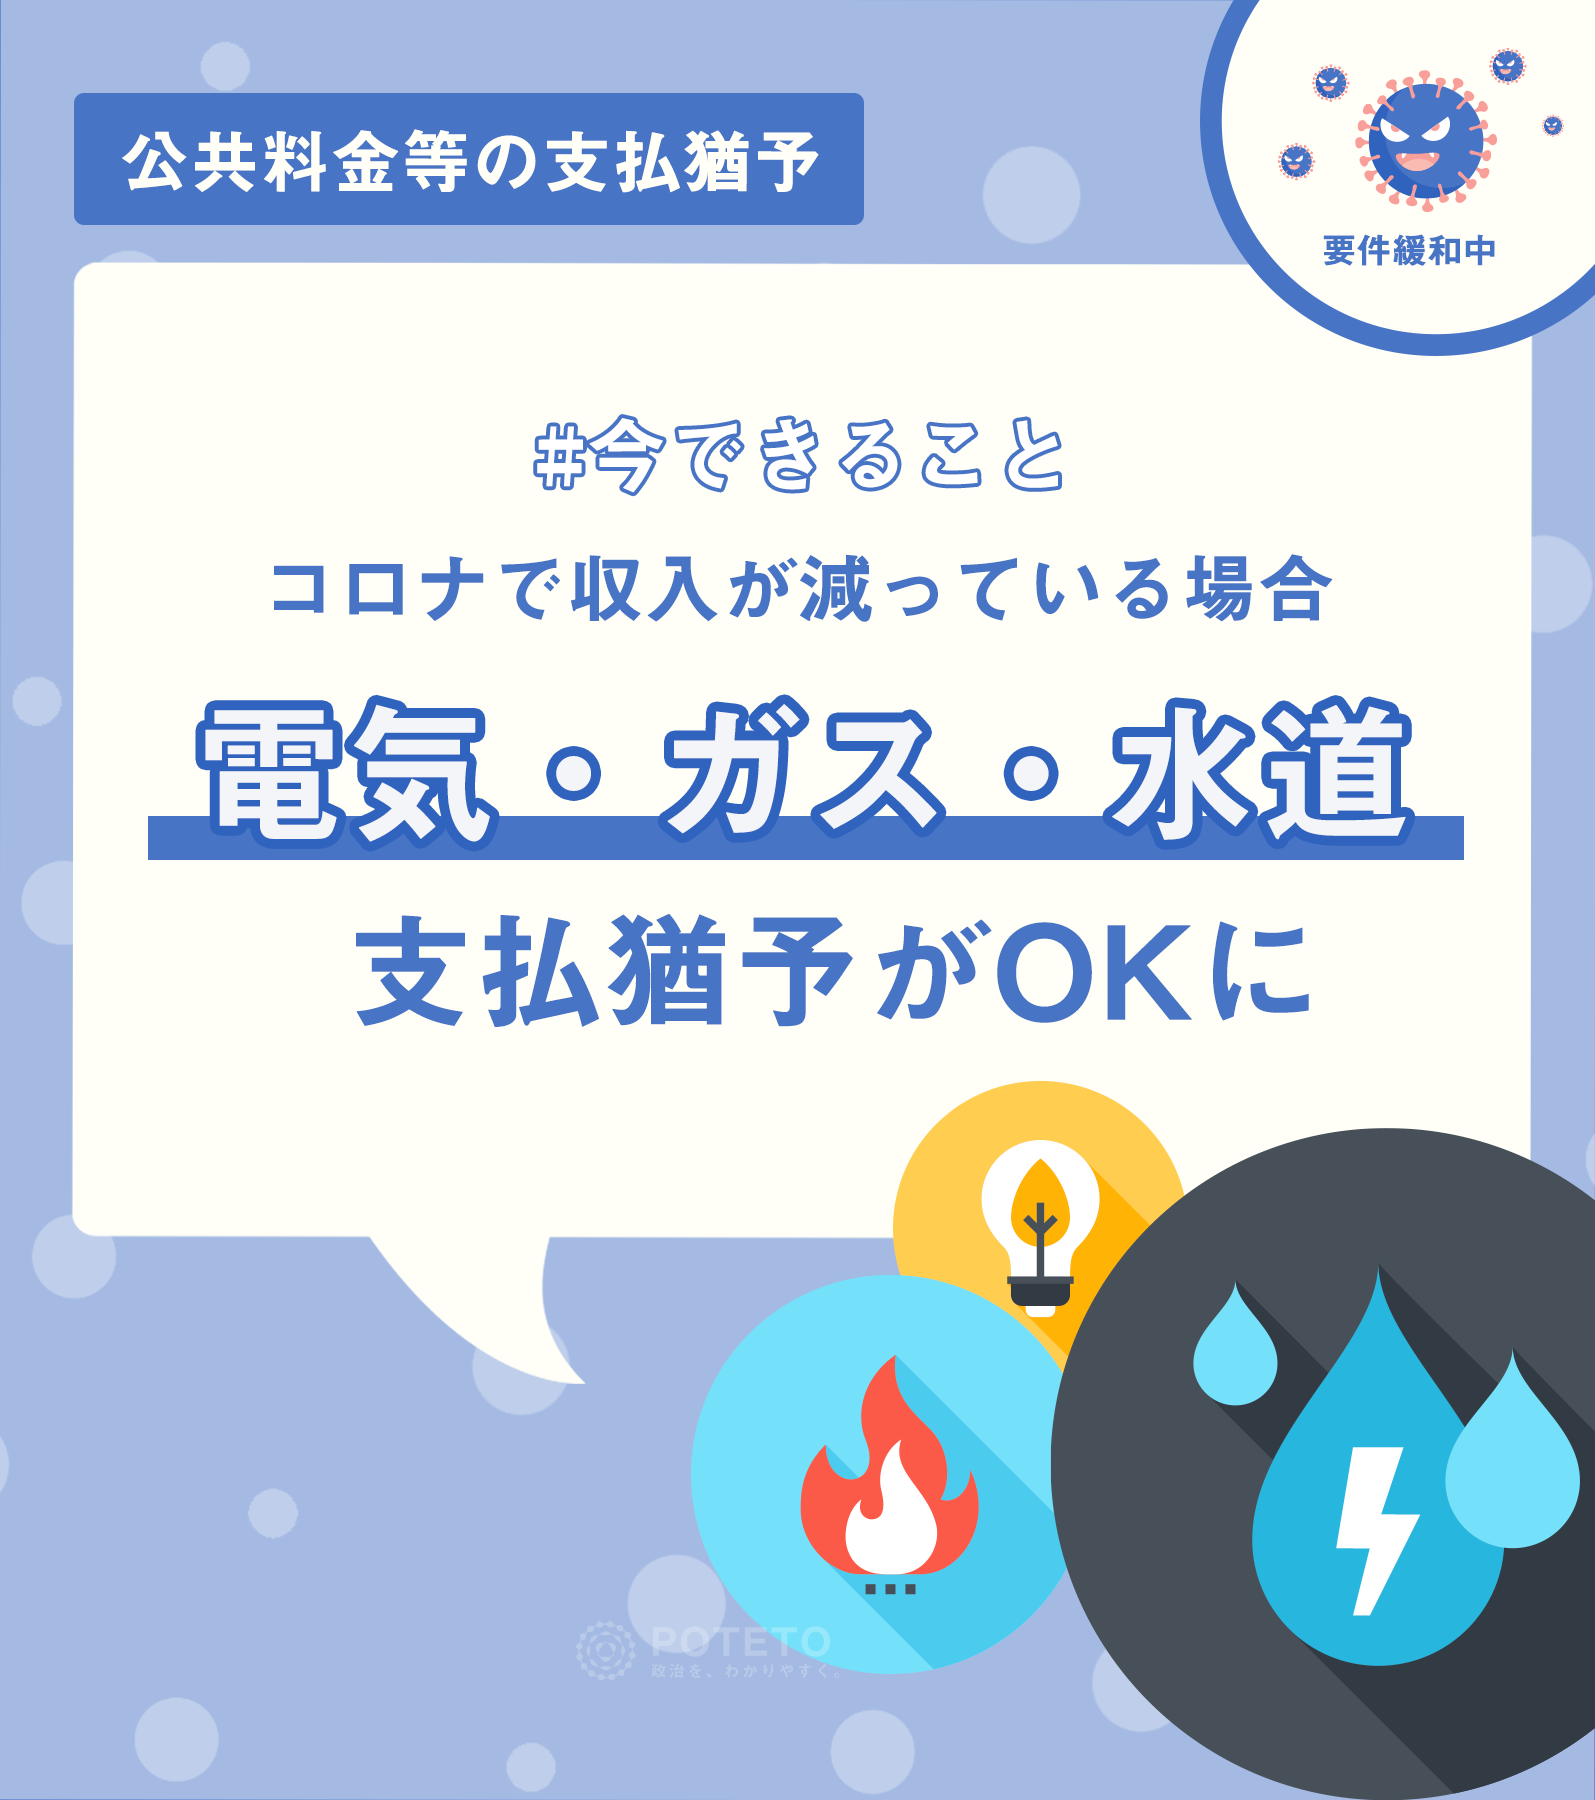 2cfff265ce7b47279ac2c97b5f2f159e - 「電気・ガス・水道」の支払い猶予